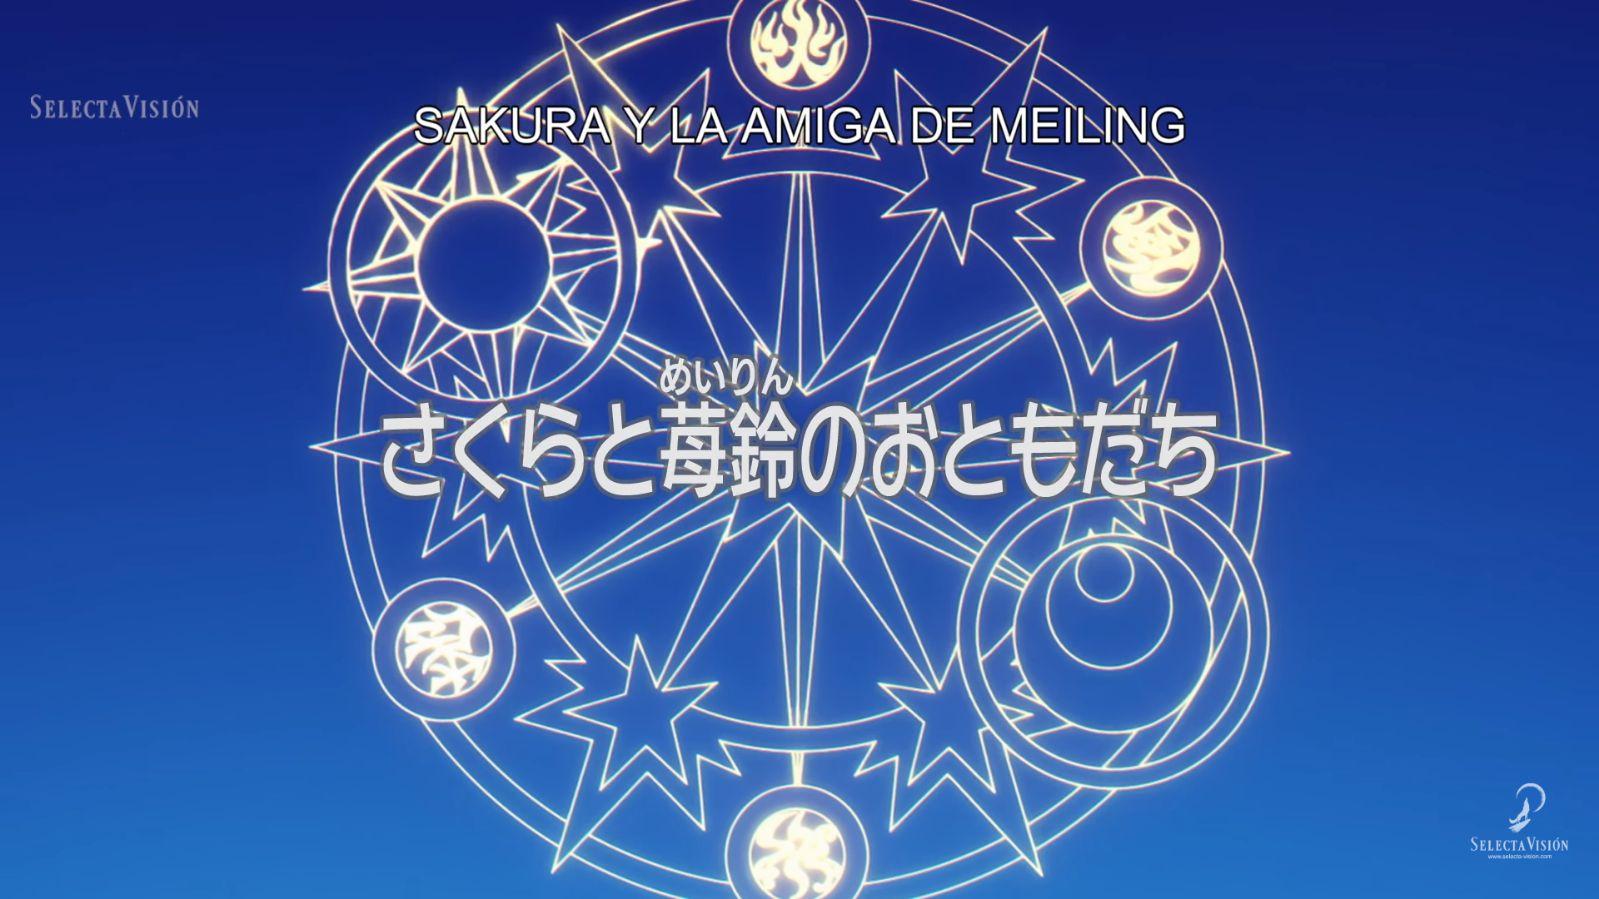 Cardcaptor Sakura Clear Card analisis episodio 16